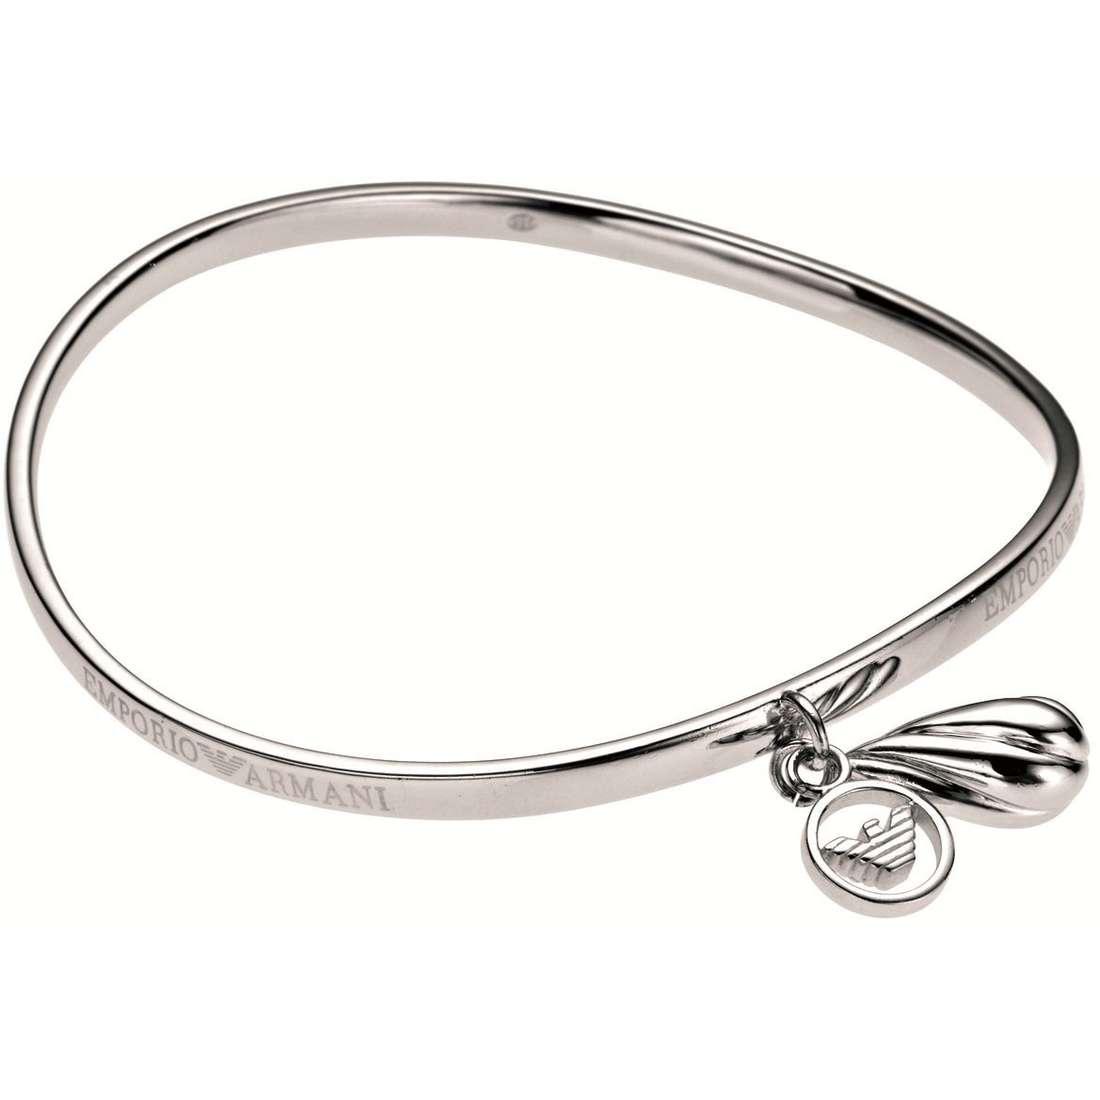 bracelet woman jewellery Emporio Armani EG278804019